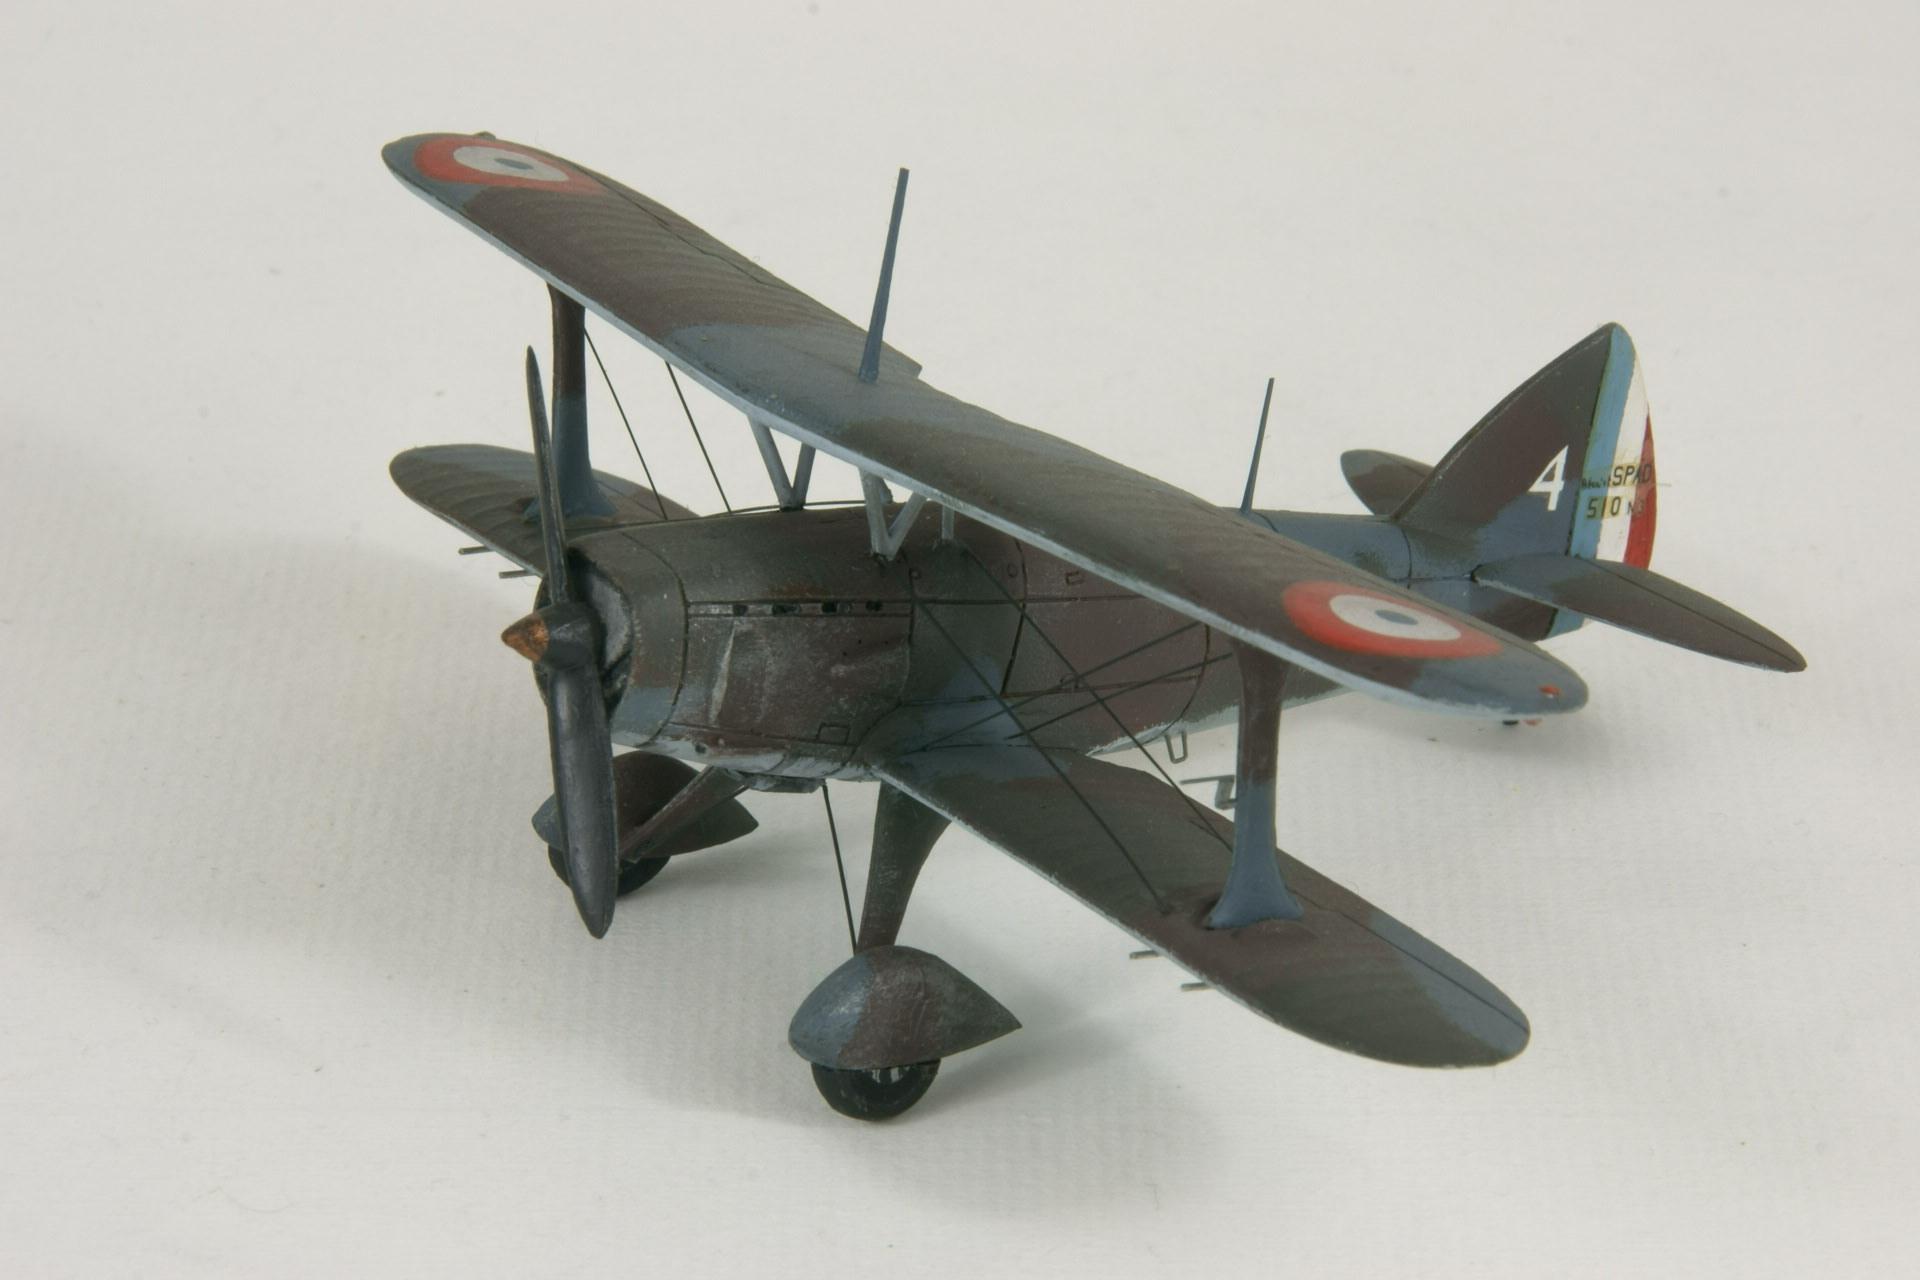 Bleriot spad 510 1 2